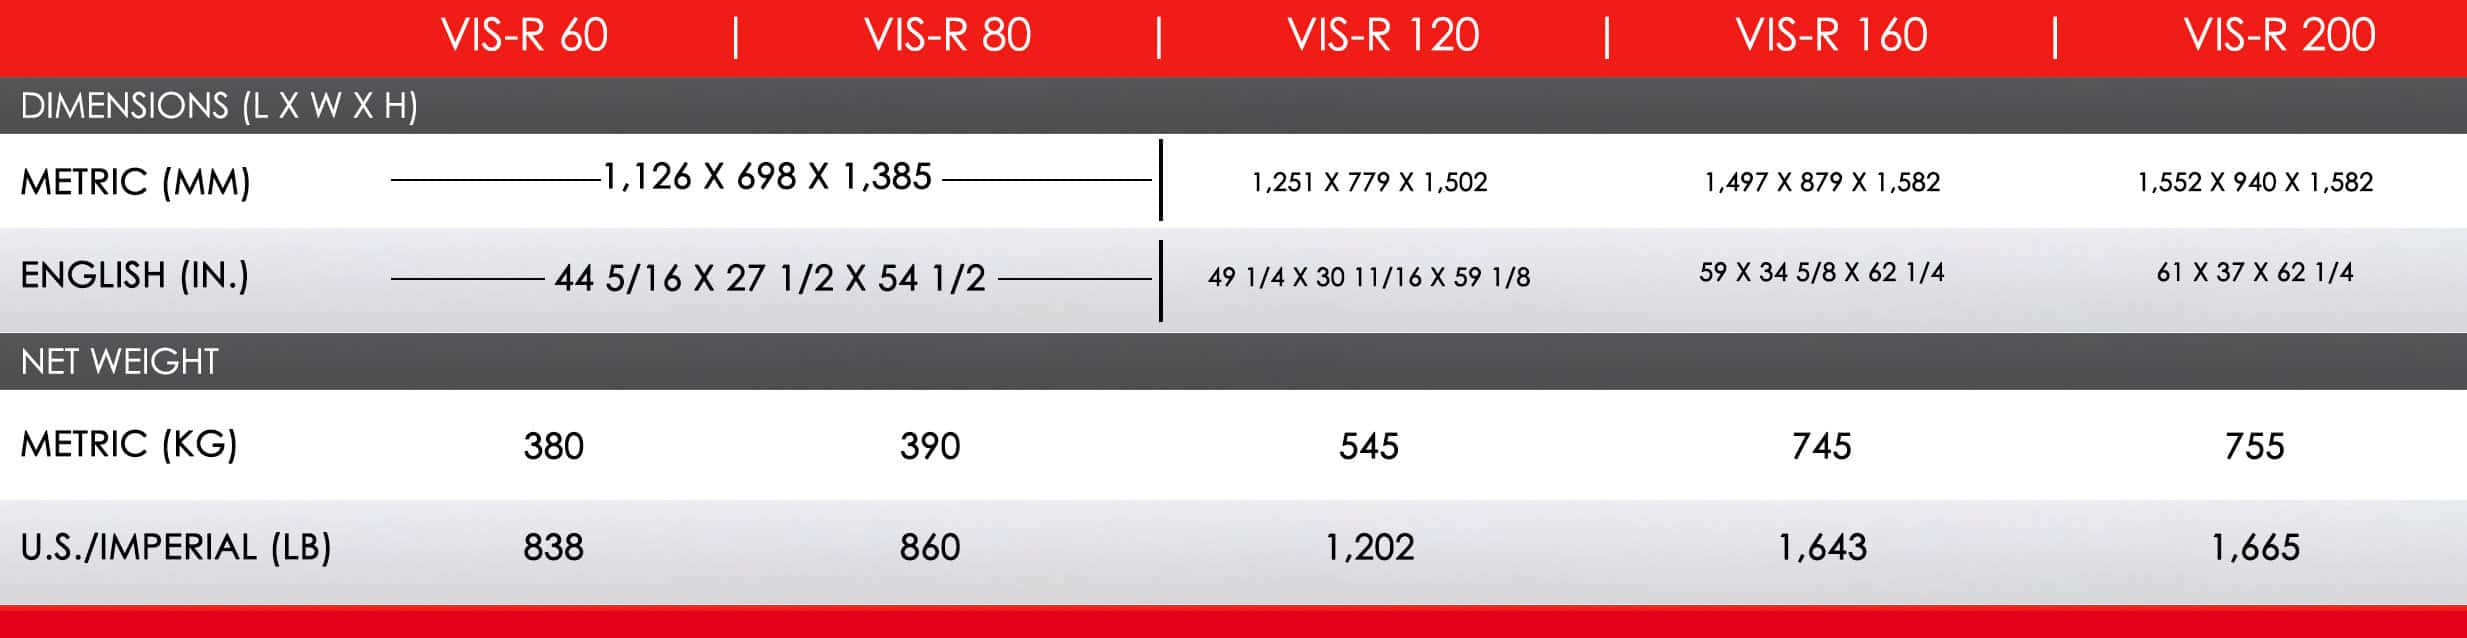 VIS-R Series Dimensions Specs